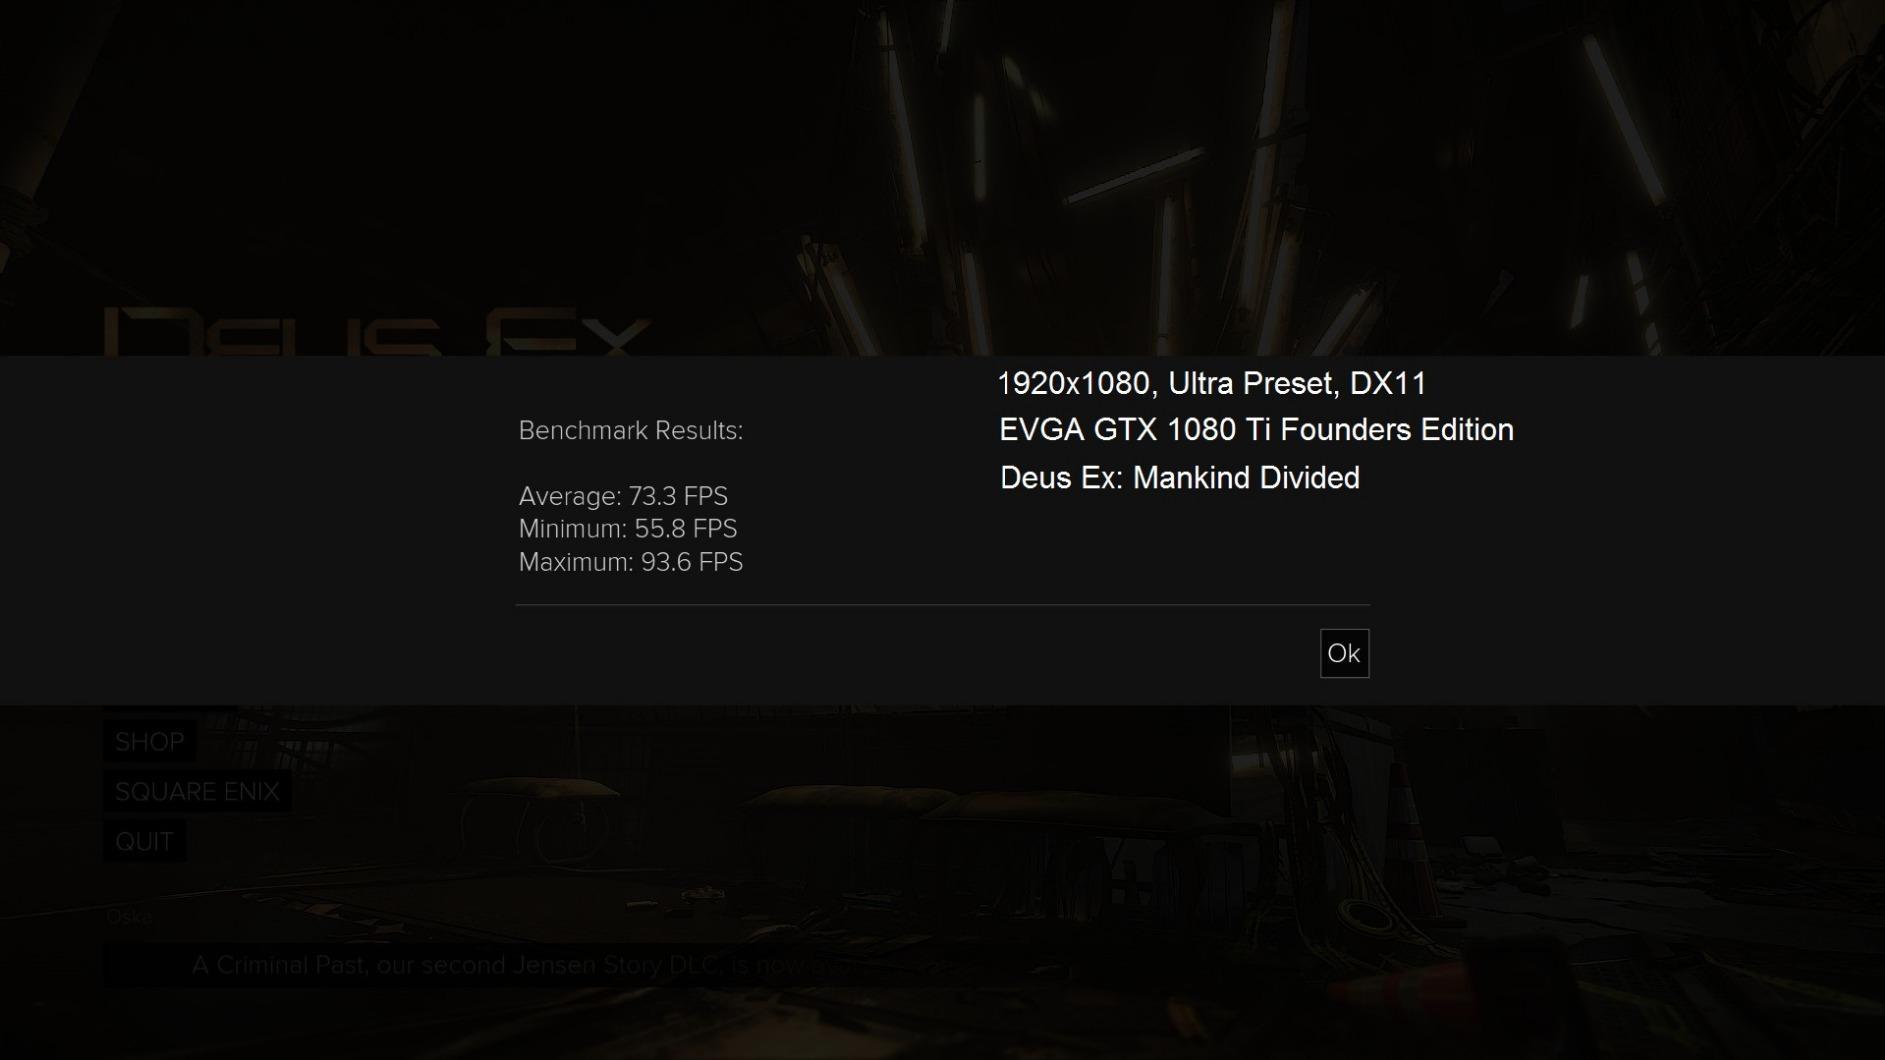 EVGA GeForce GTX 1080 Ti K|NGP|N Gaming 11GB GDDR5X iCX Technology